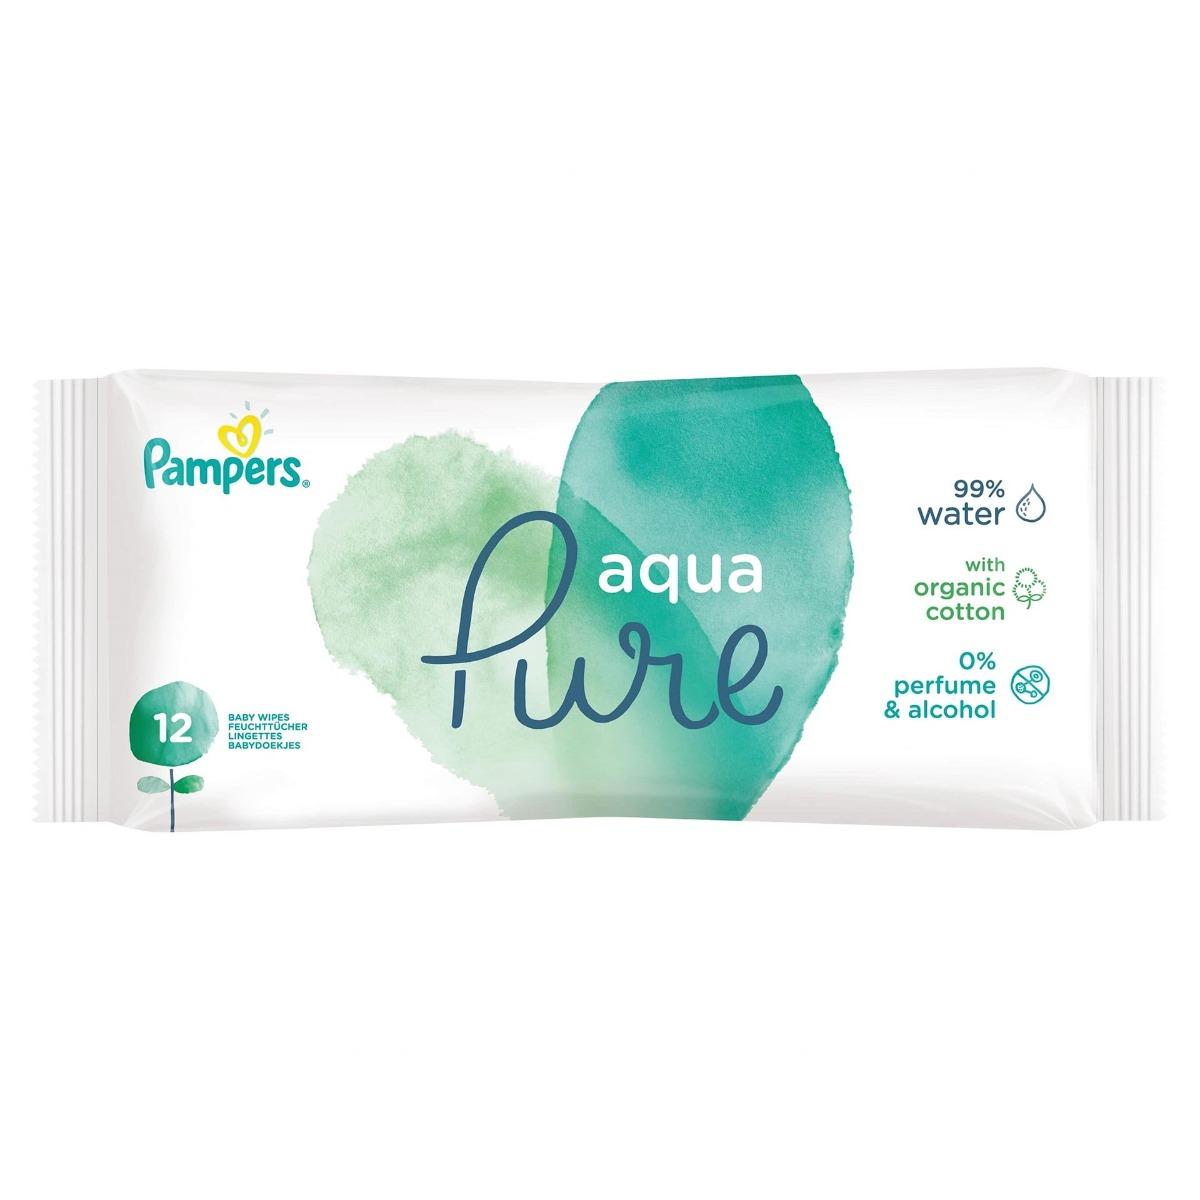 Servetele umede Aqua Pure, 12 bucati, Pampers drmax.ro